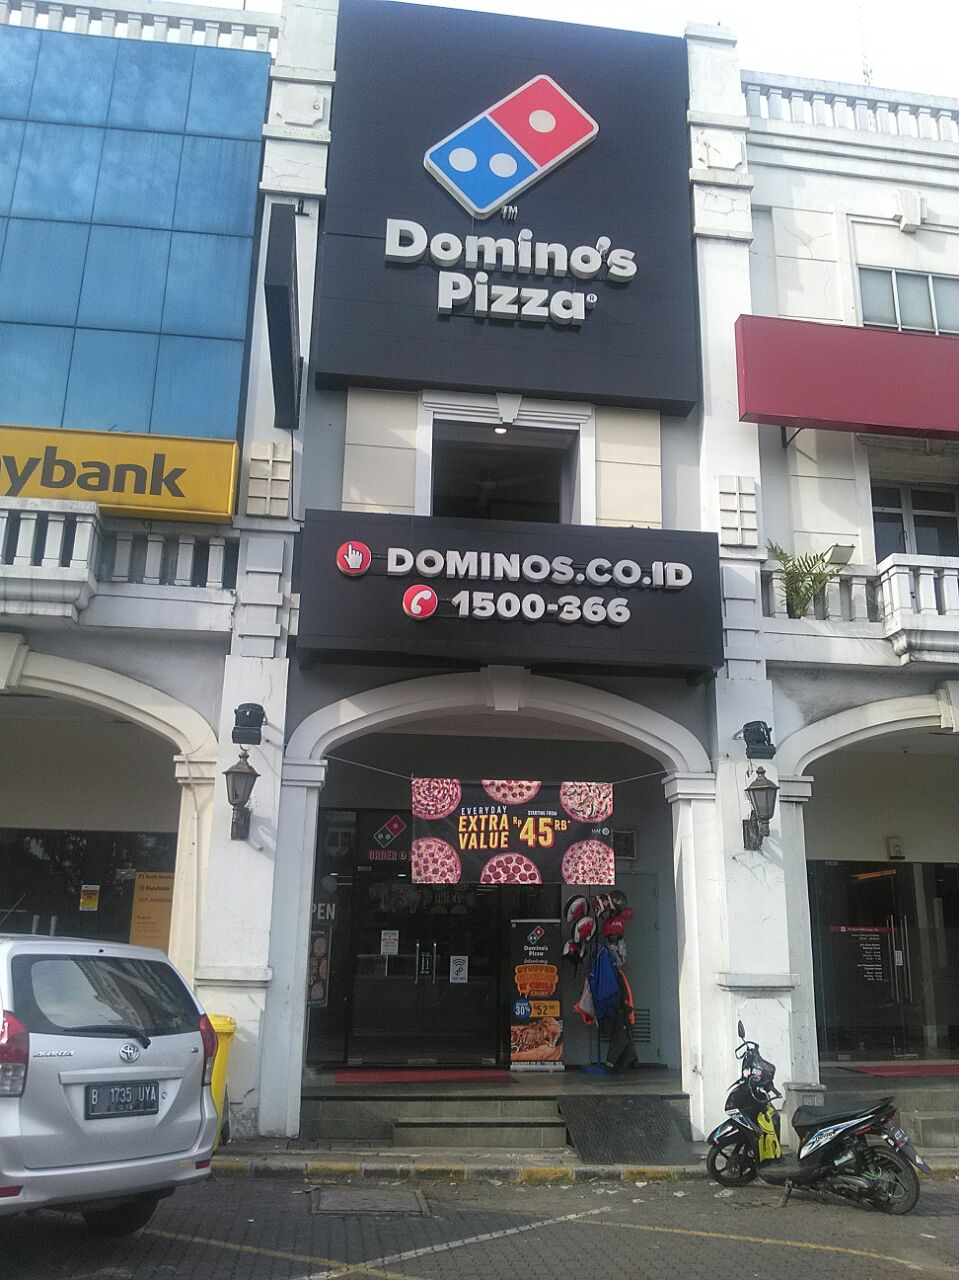 Domino's Pizza - Kec Cikarang Selatan, Bekasi